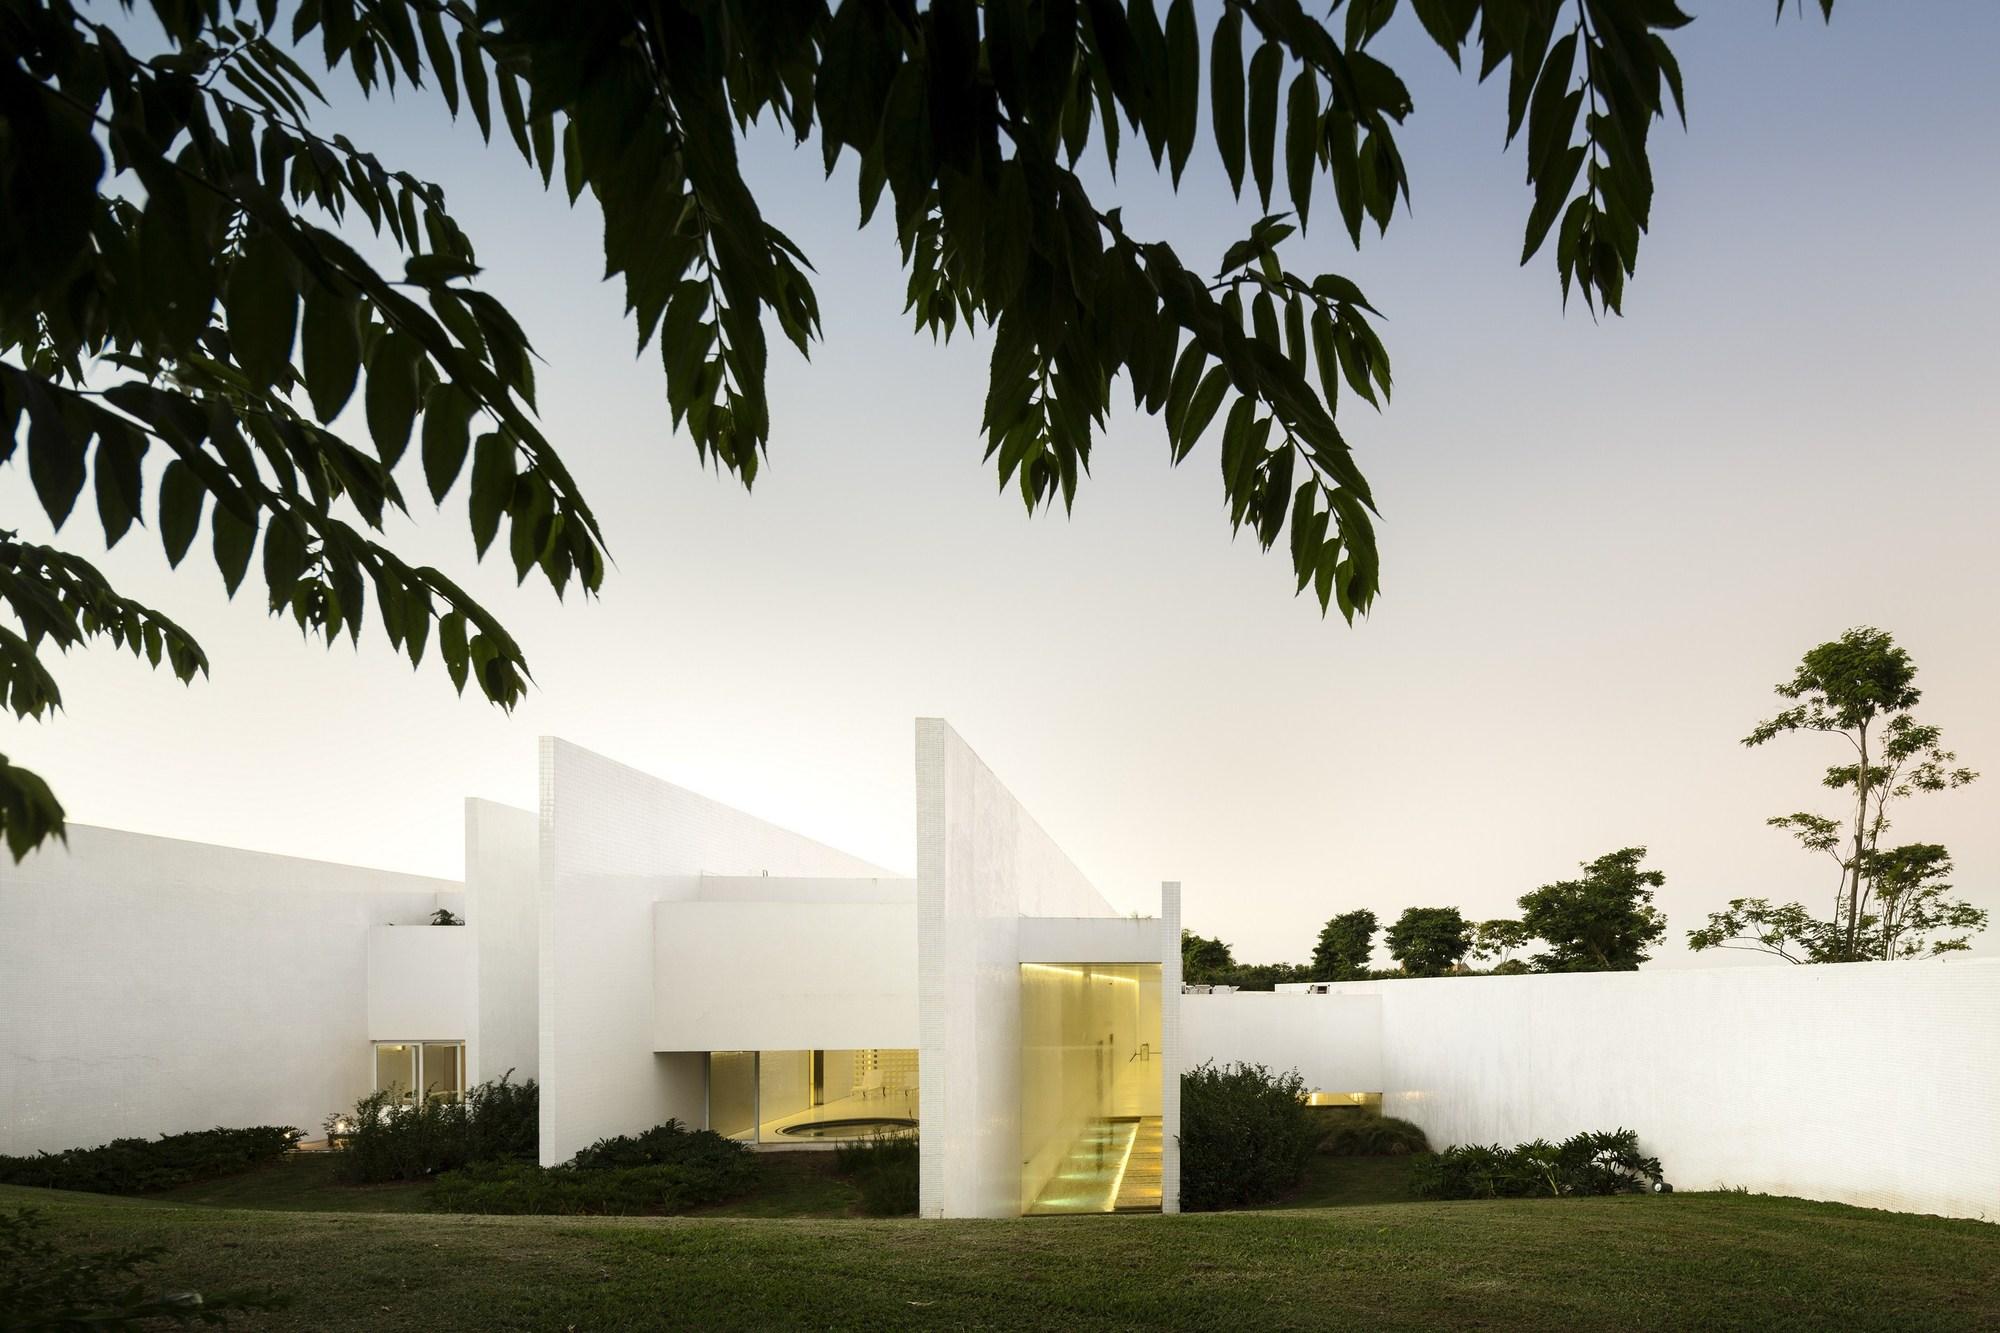 Isay Weinfeld Oficina Plataforma Arquitectura # Muebles De Bano Fazenda